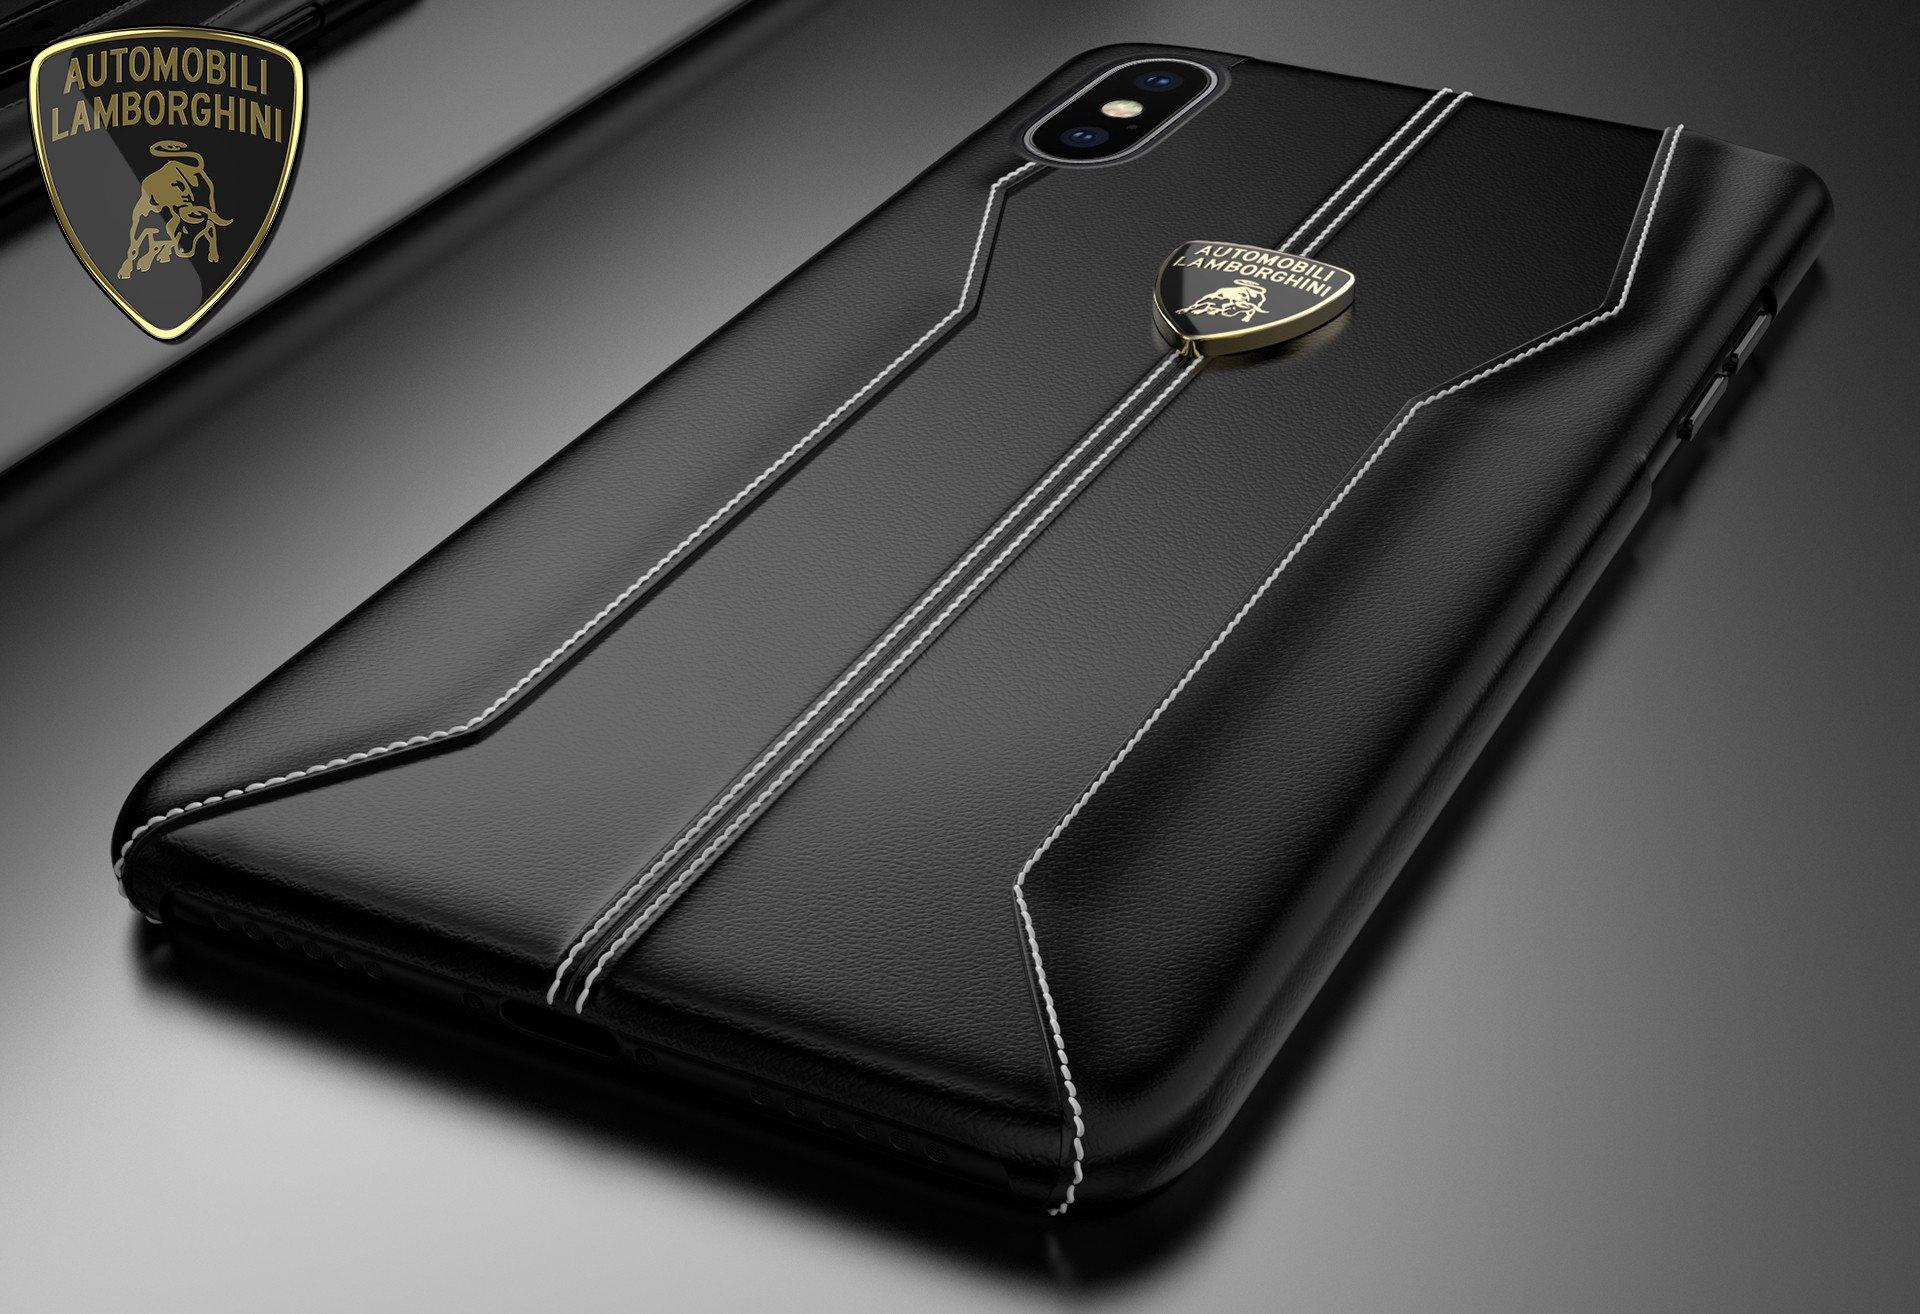 iphone xs case lamborghini